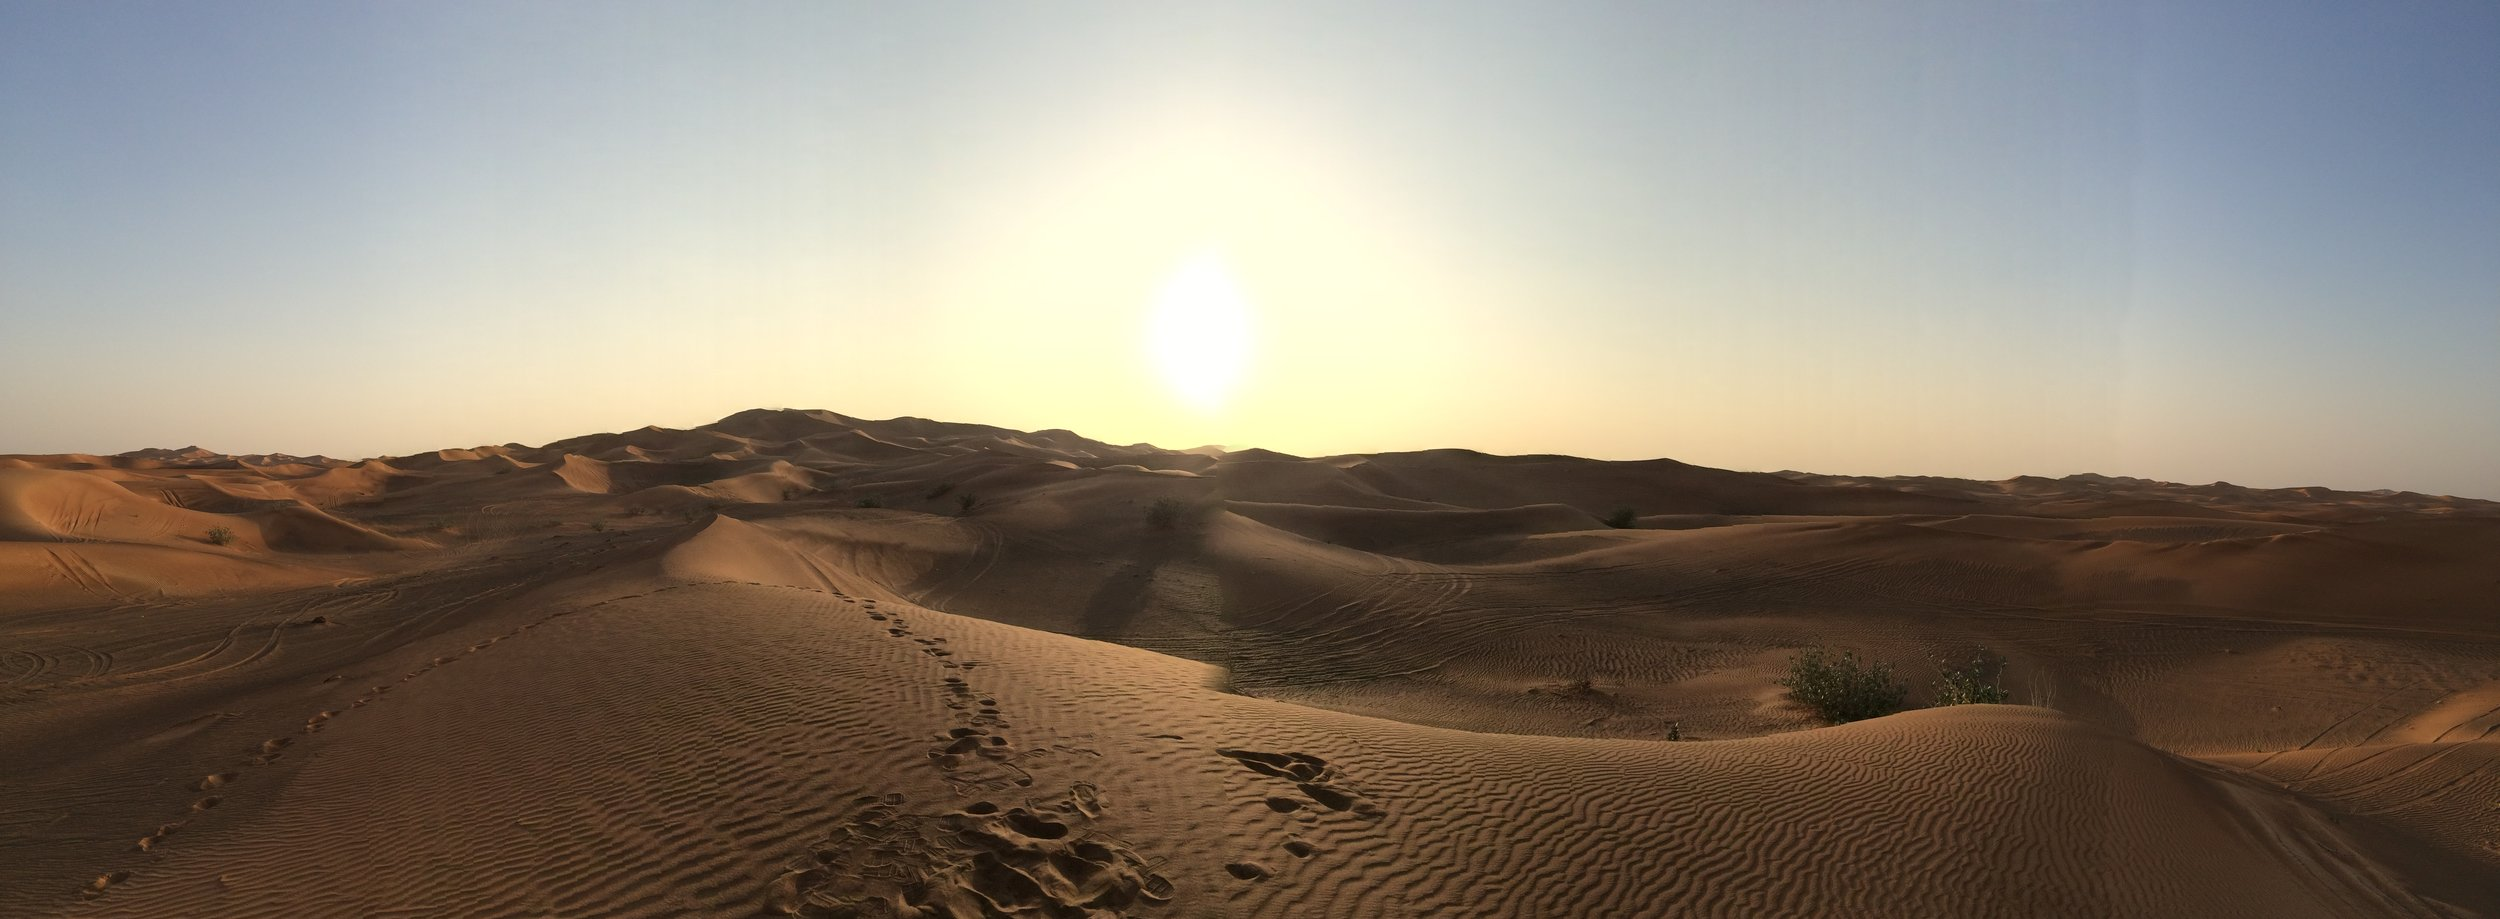 Dubai Dunes - 10.JPG